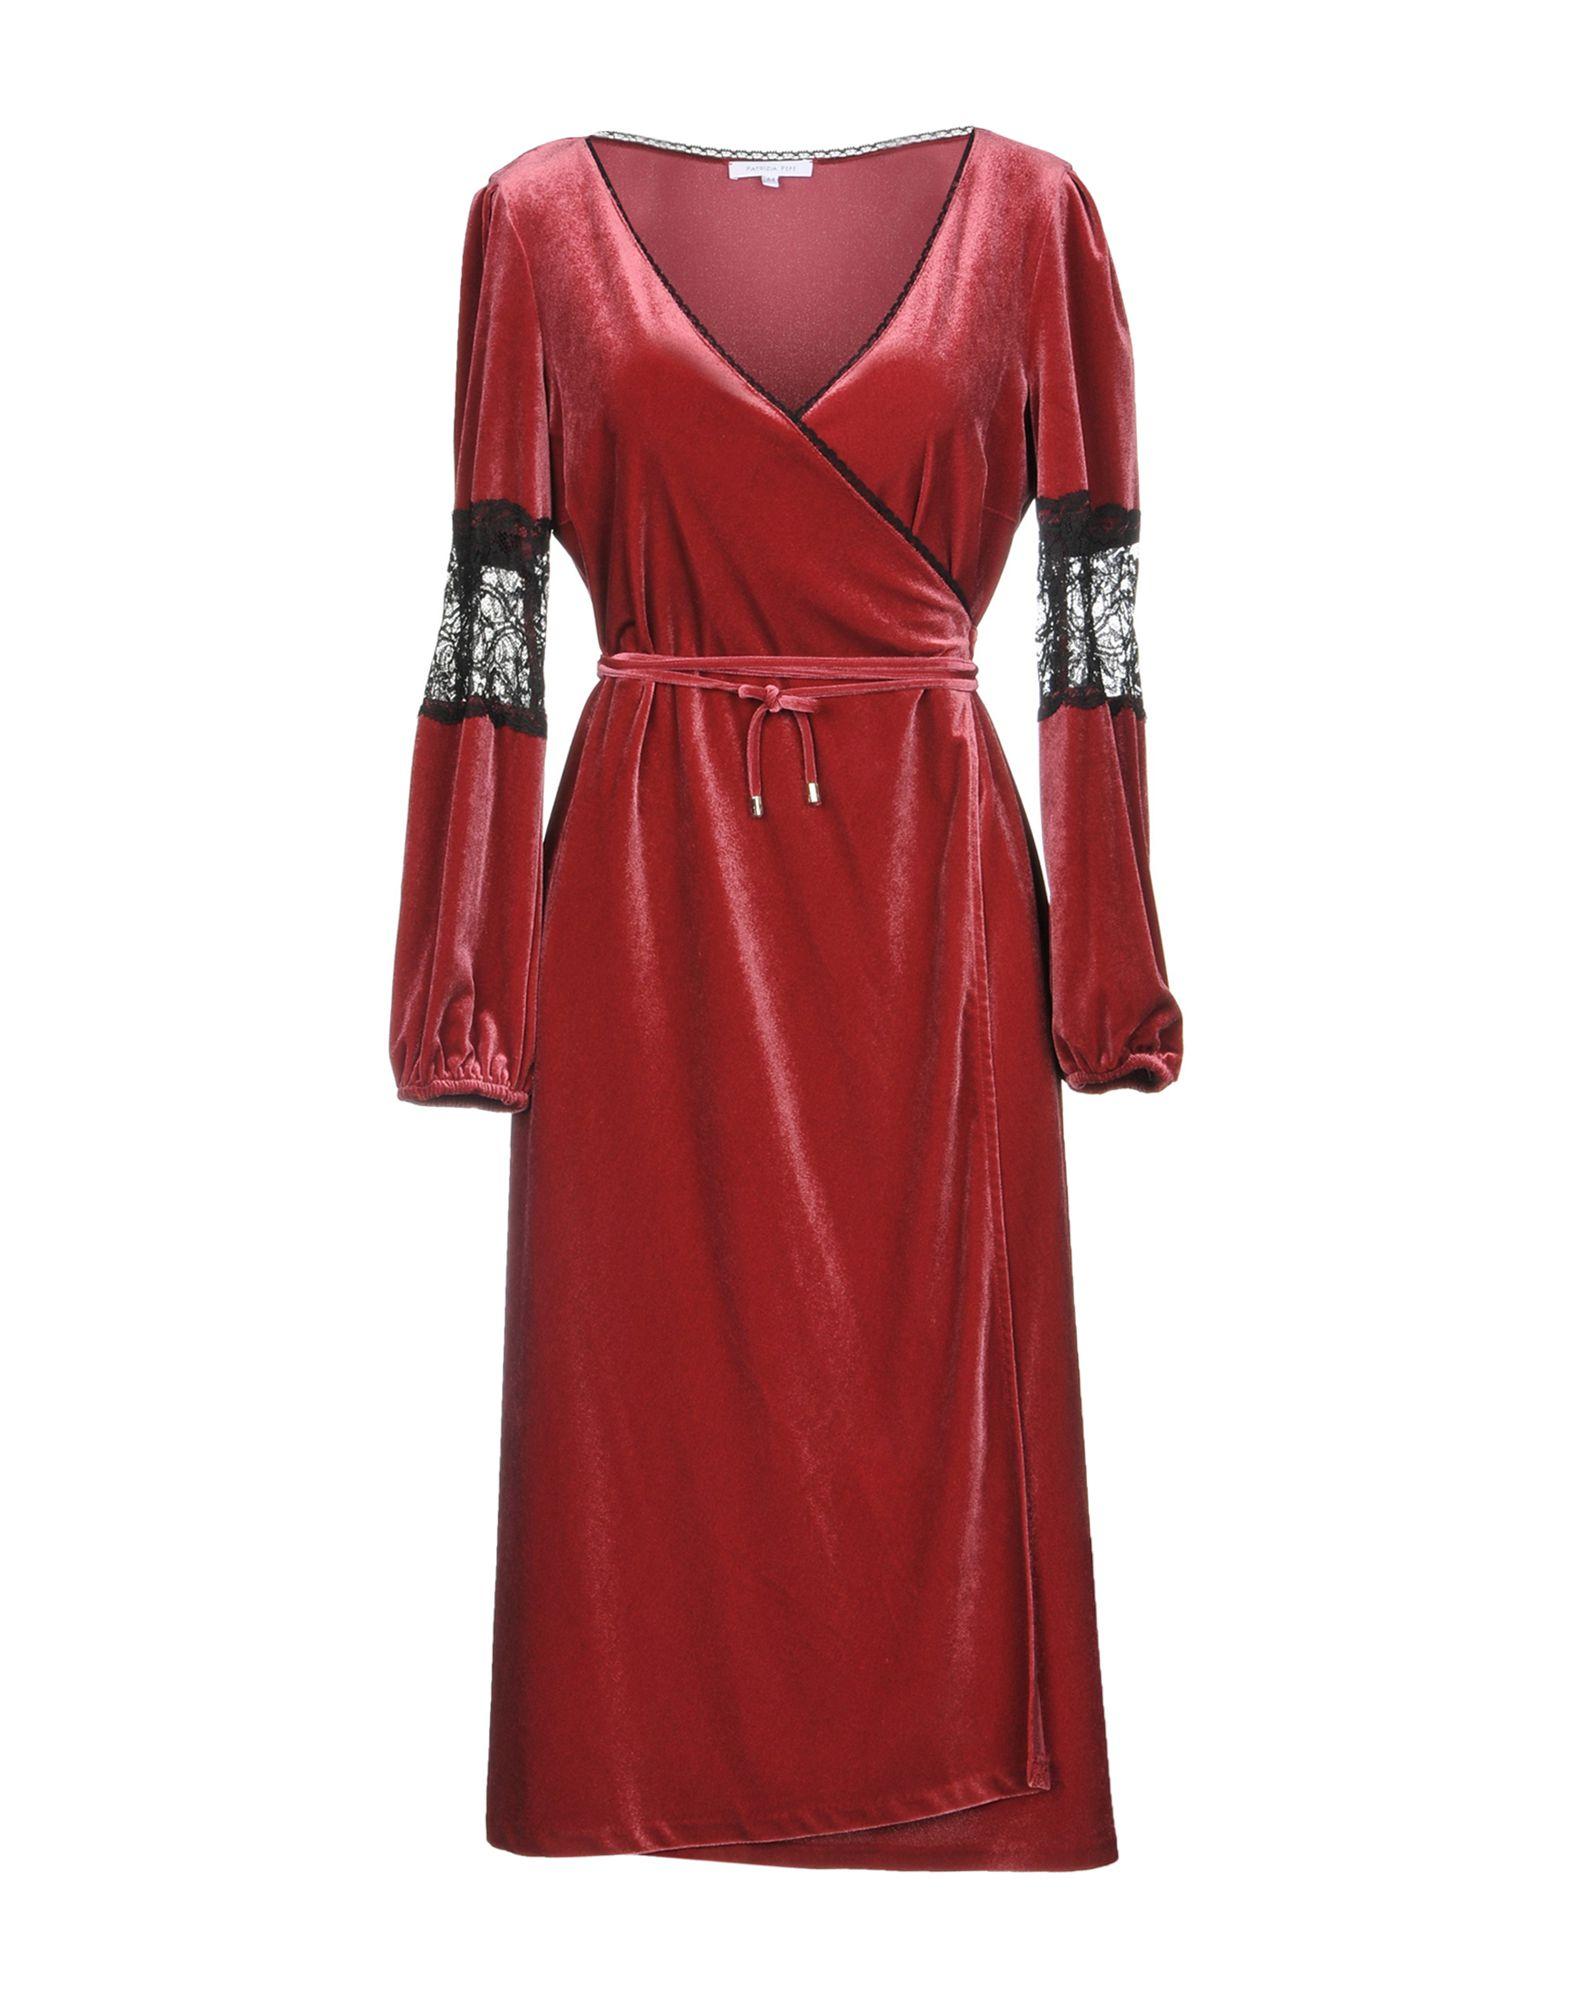 PATRIZIA PEPE Платье длиной 3/4 платье patrizia pepe patrizia pepe pa748ewptm91